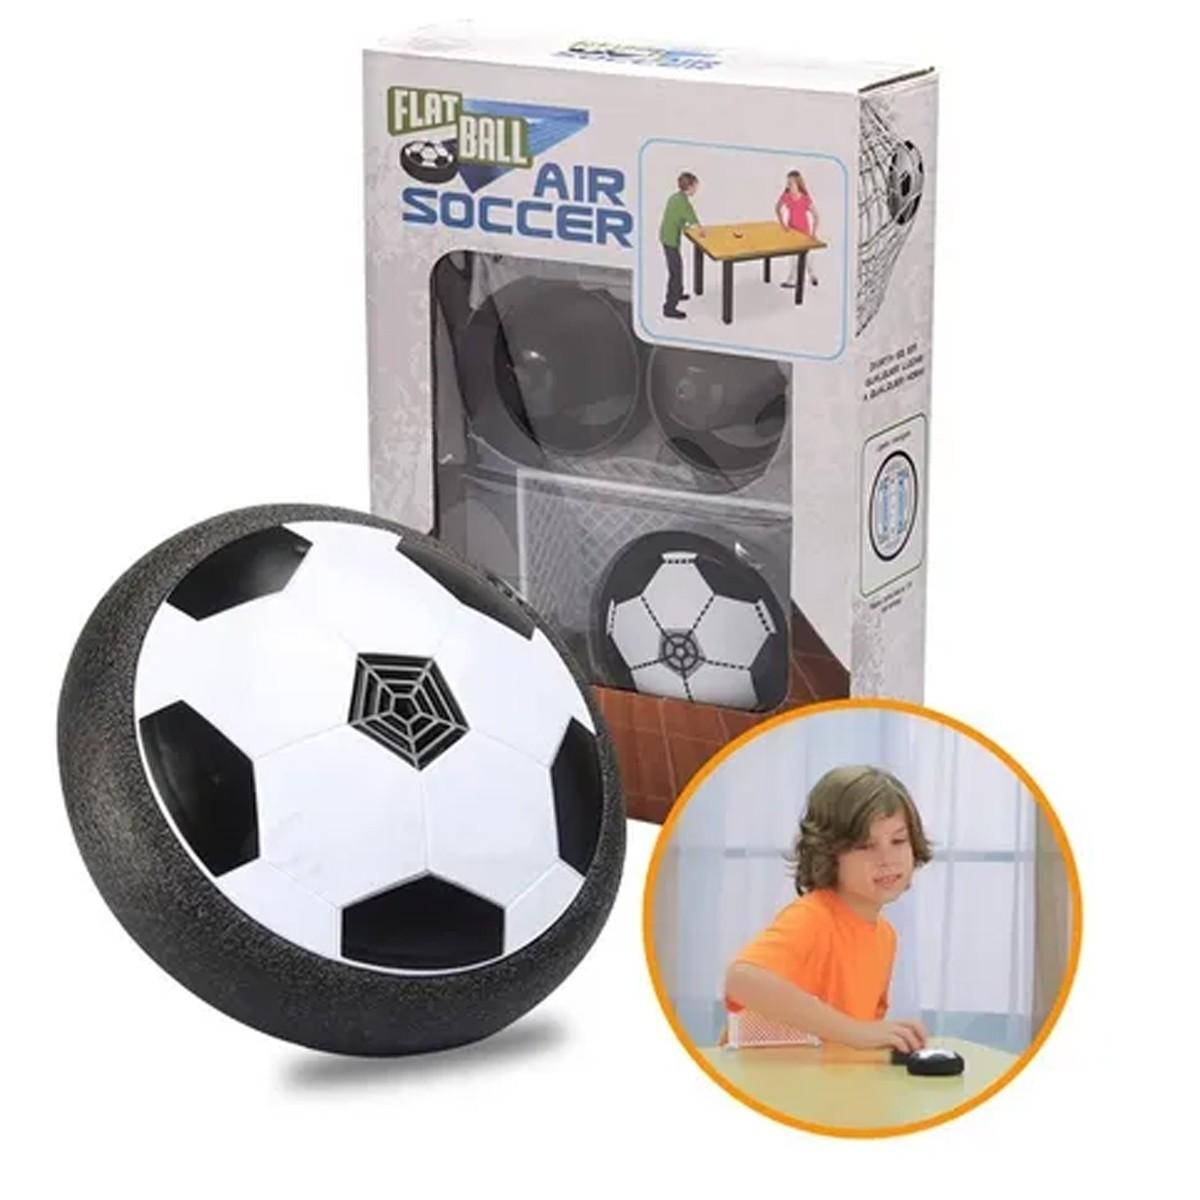 Flat Ball Air Soccer Futebol De Mesa Bola Flutuante Br373 Multikids